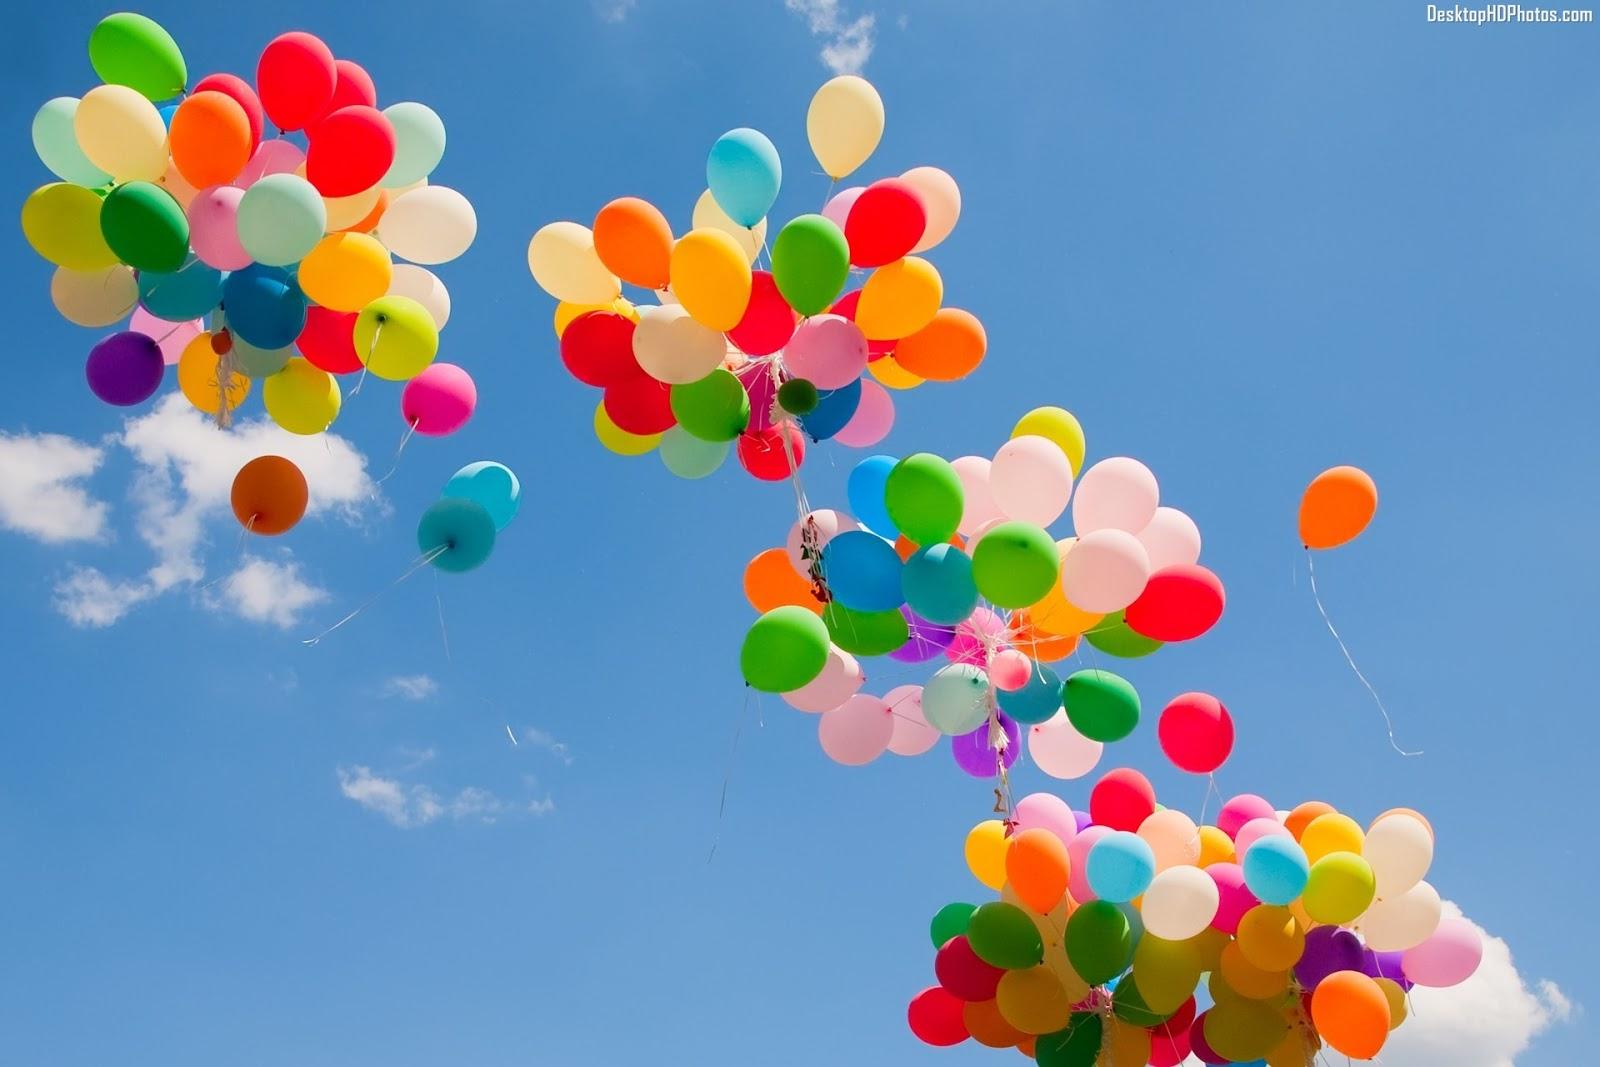 carpe diem haiku kai carpe diem special 170 michael dylan credits balloons in the sky